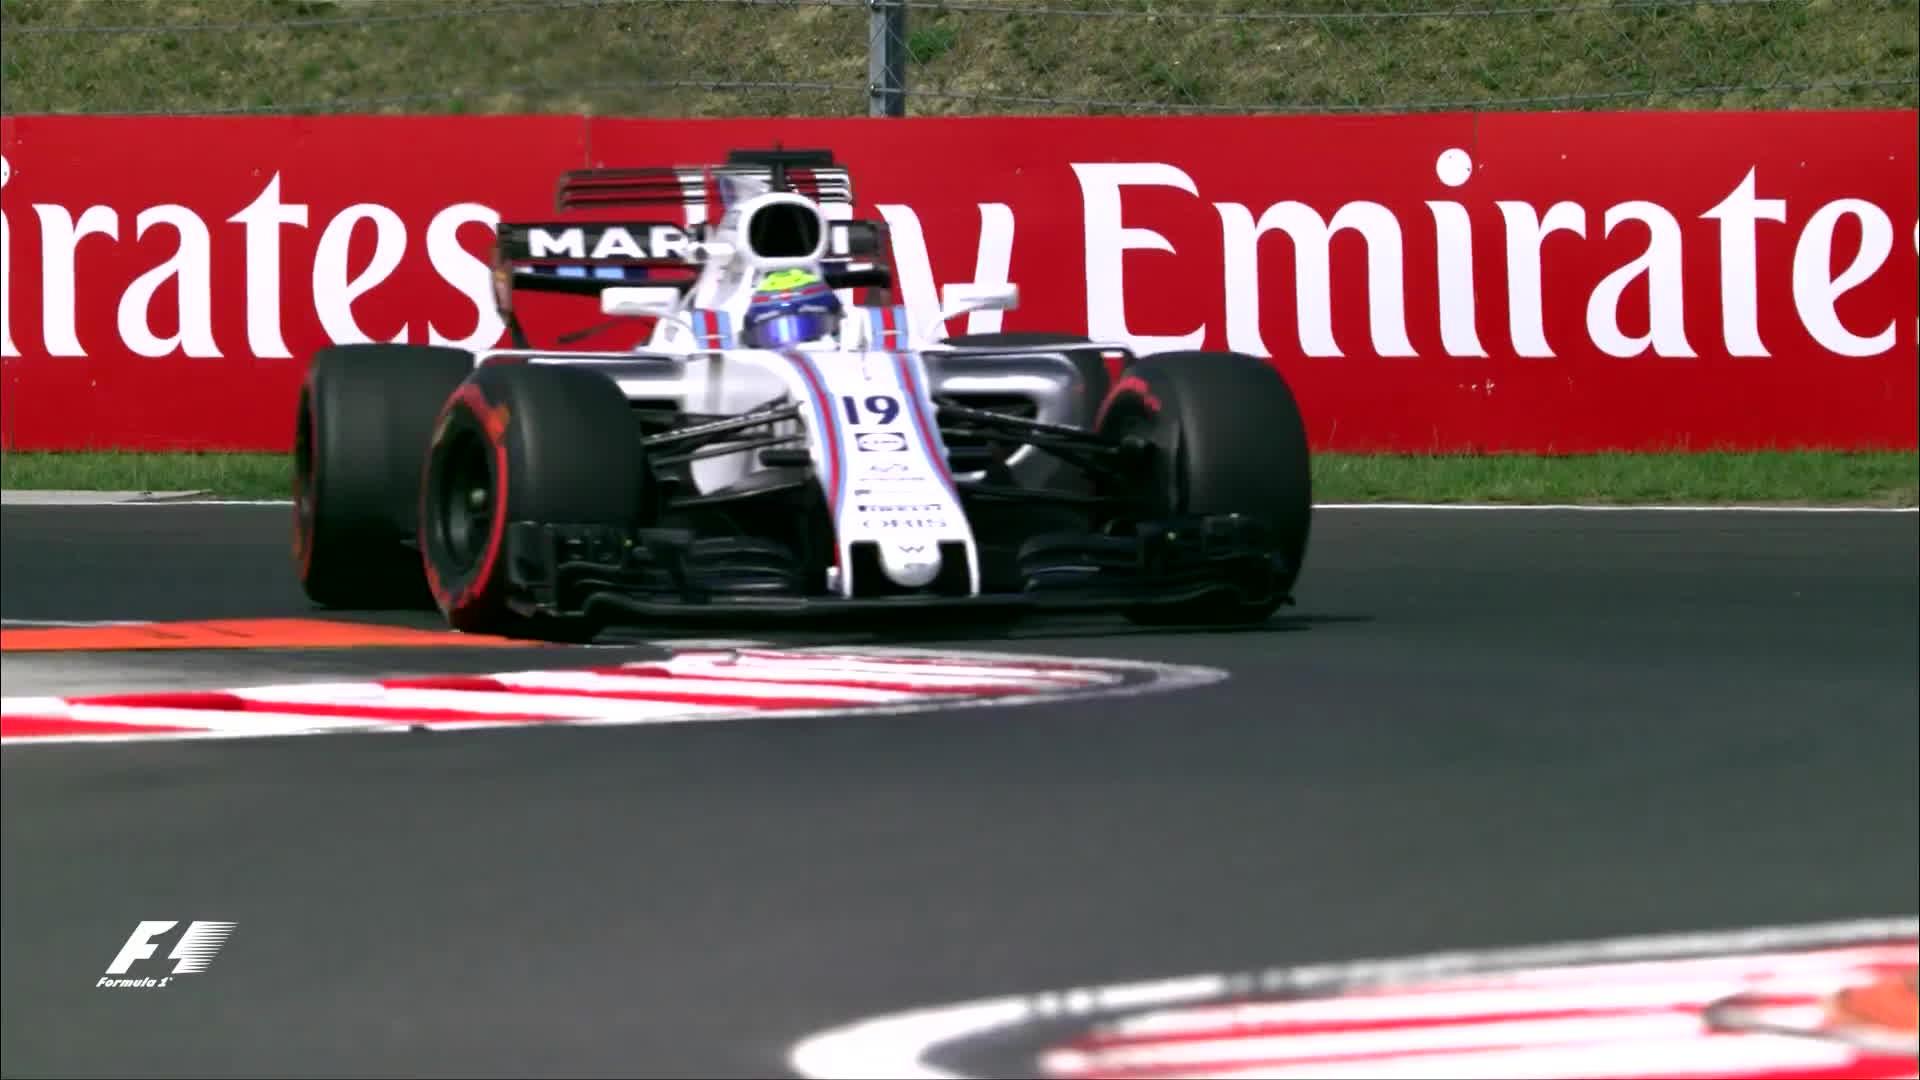 f1, formula 1, formula one, 2017 Hungarian Grand Prix | FP2 Summary GIFs